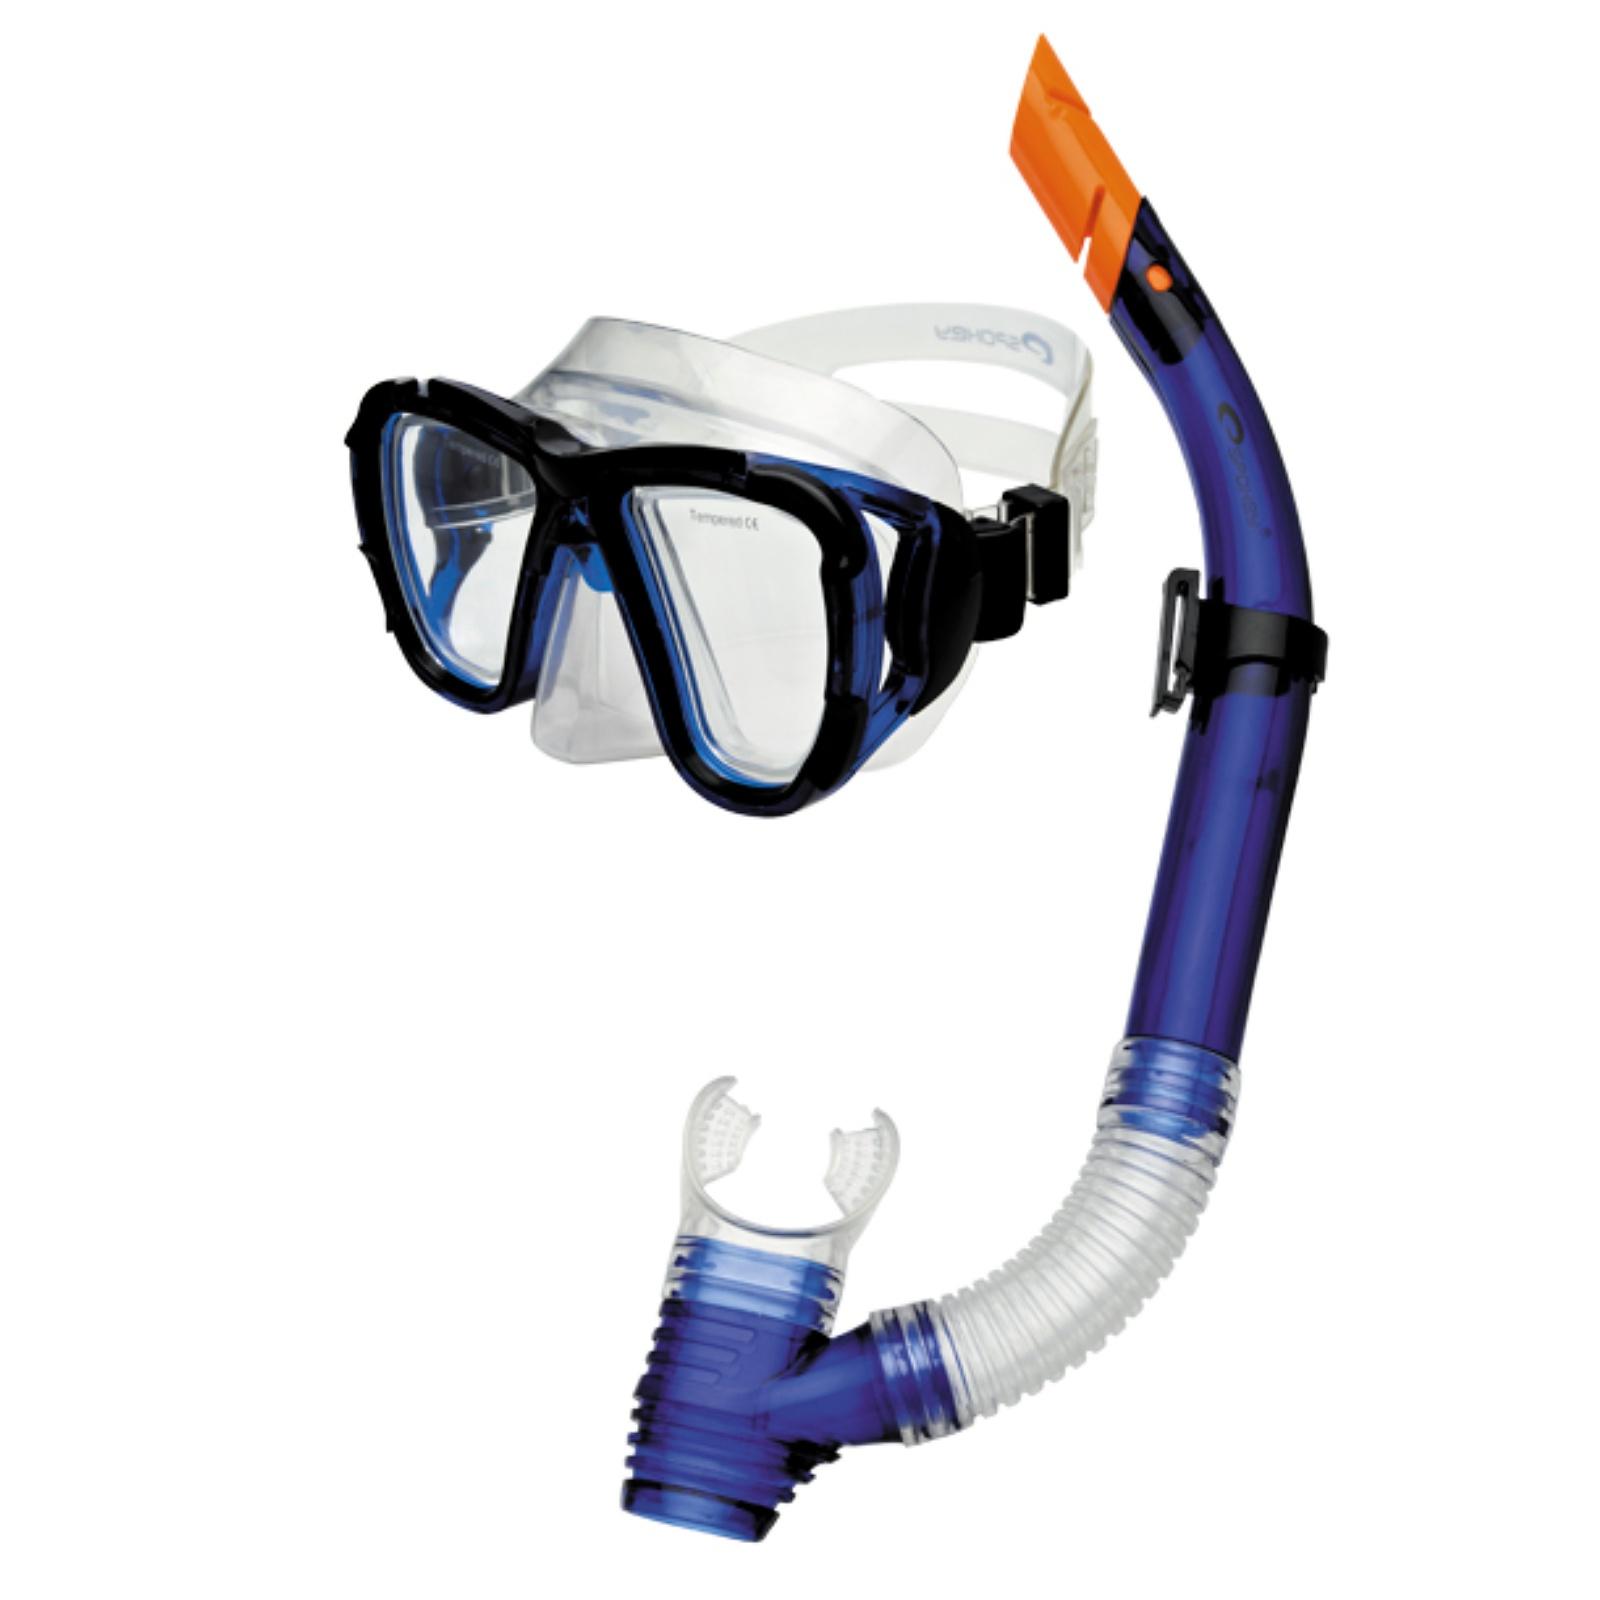 Potápěčský set SPOKEY Coral - modrý